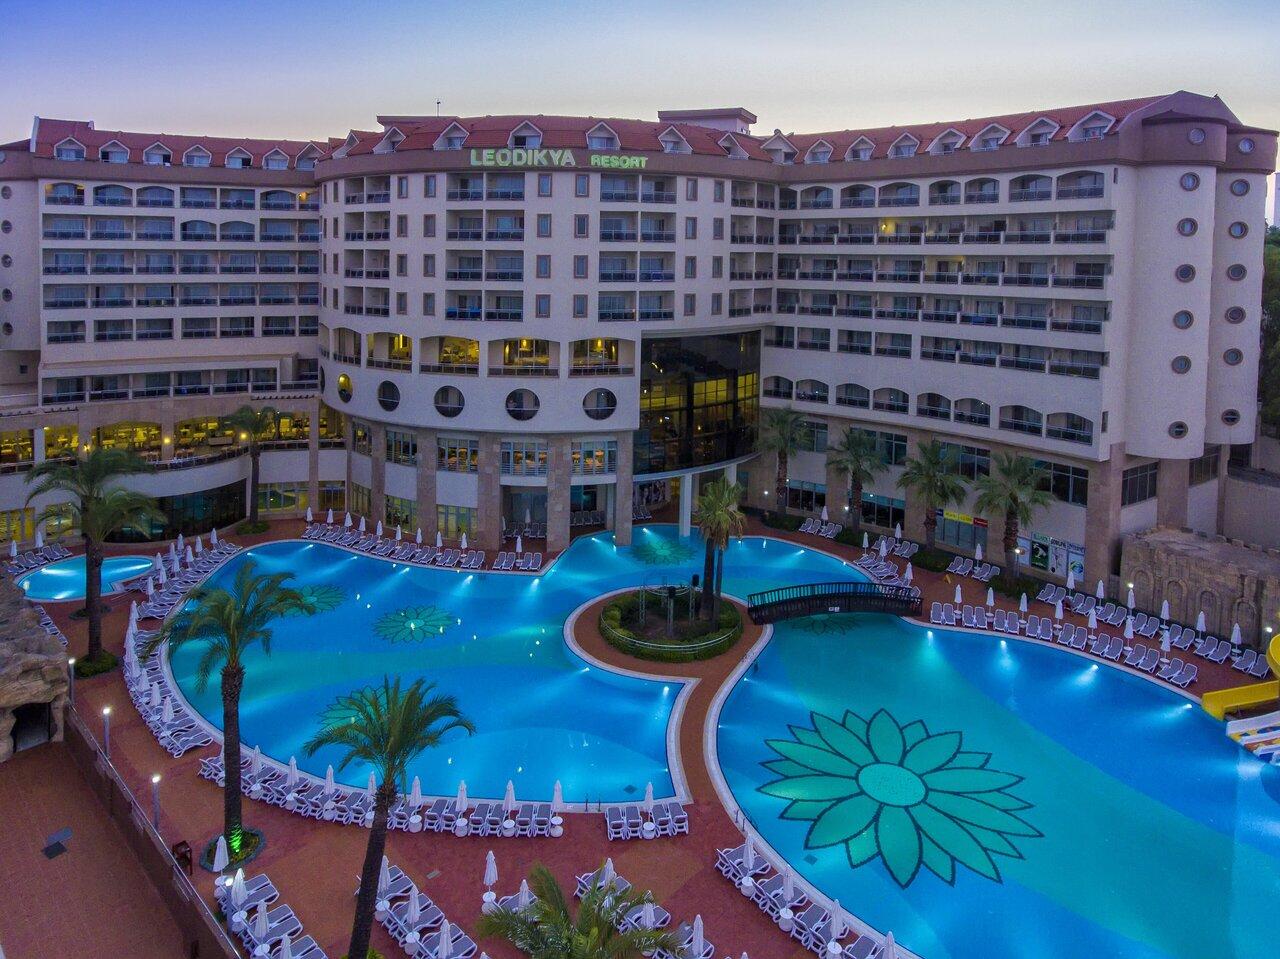 Leodikya Resort